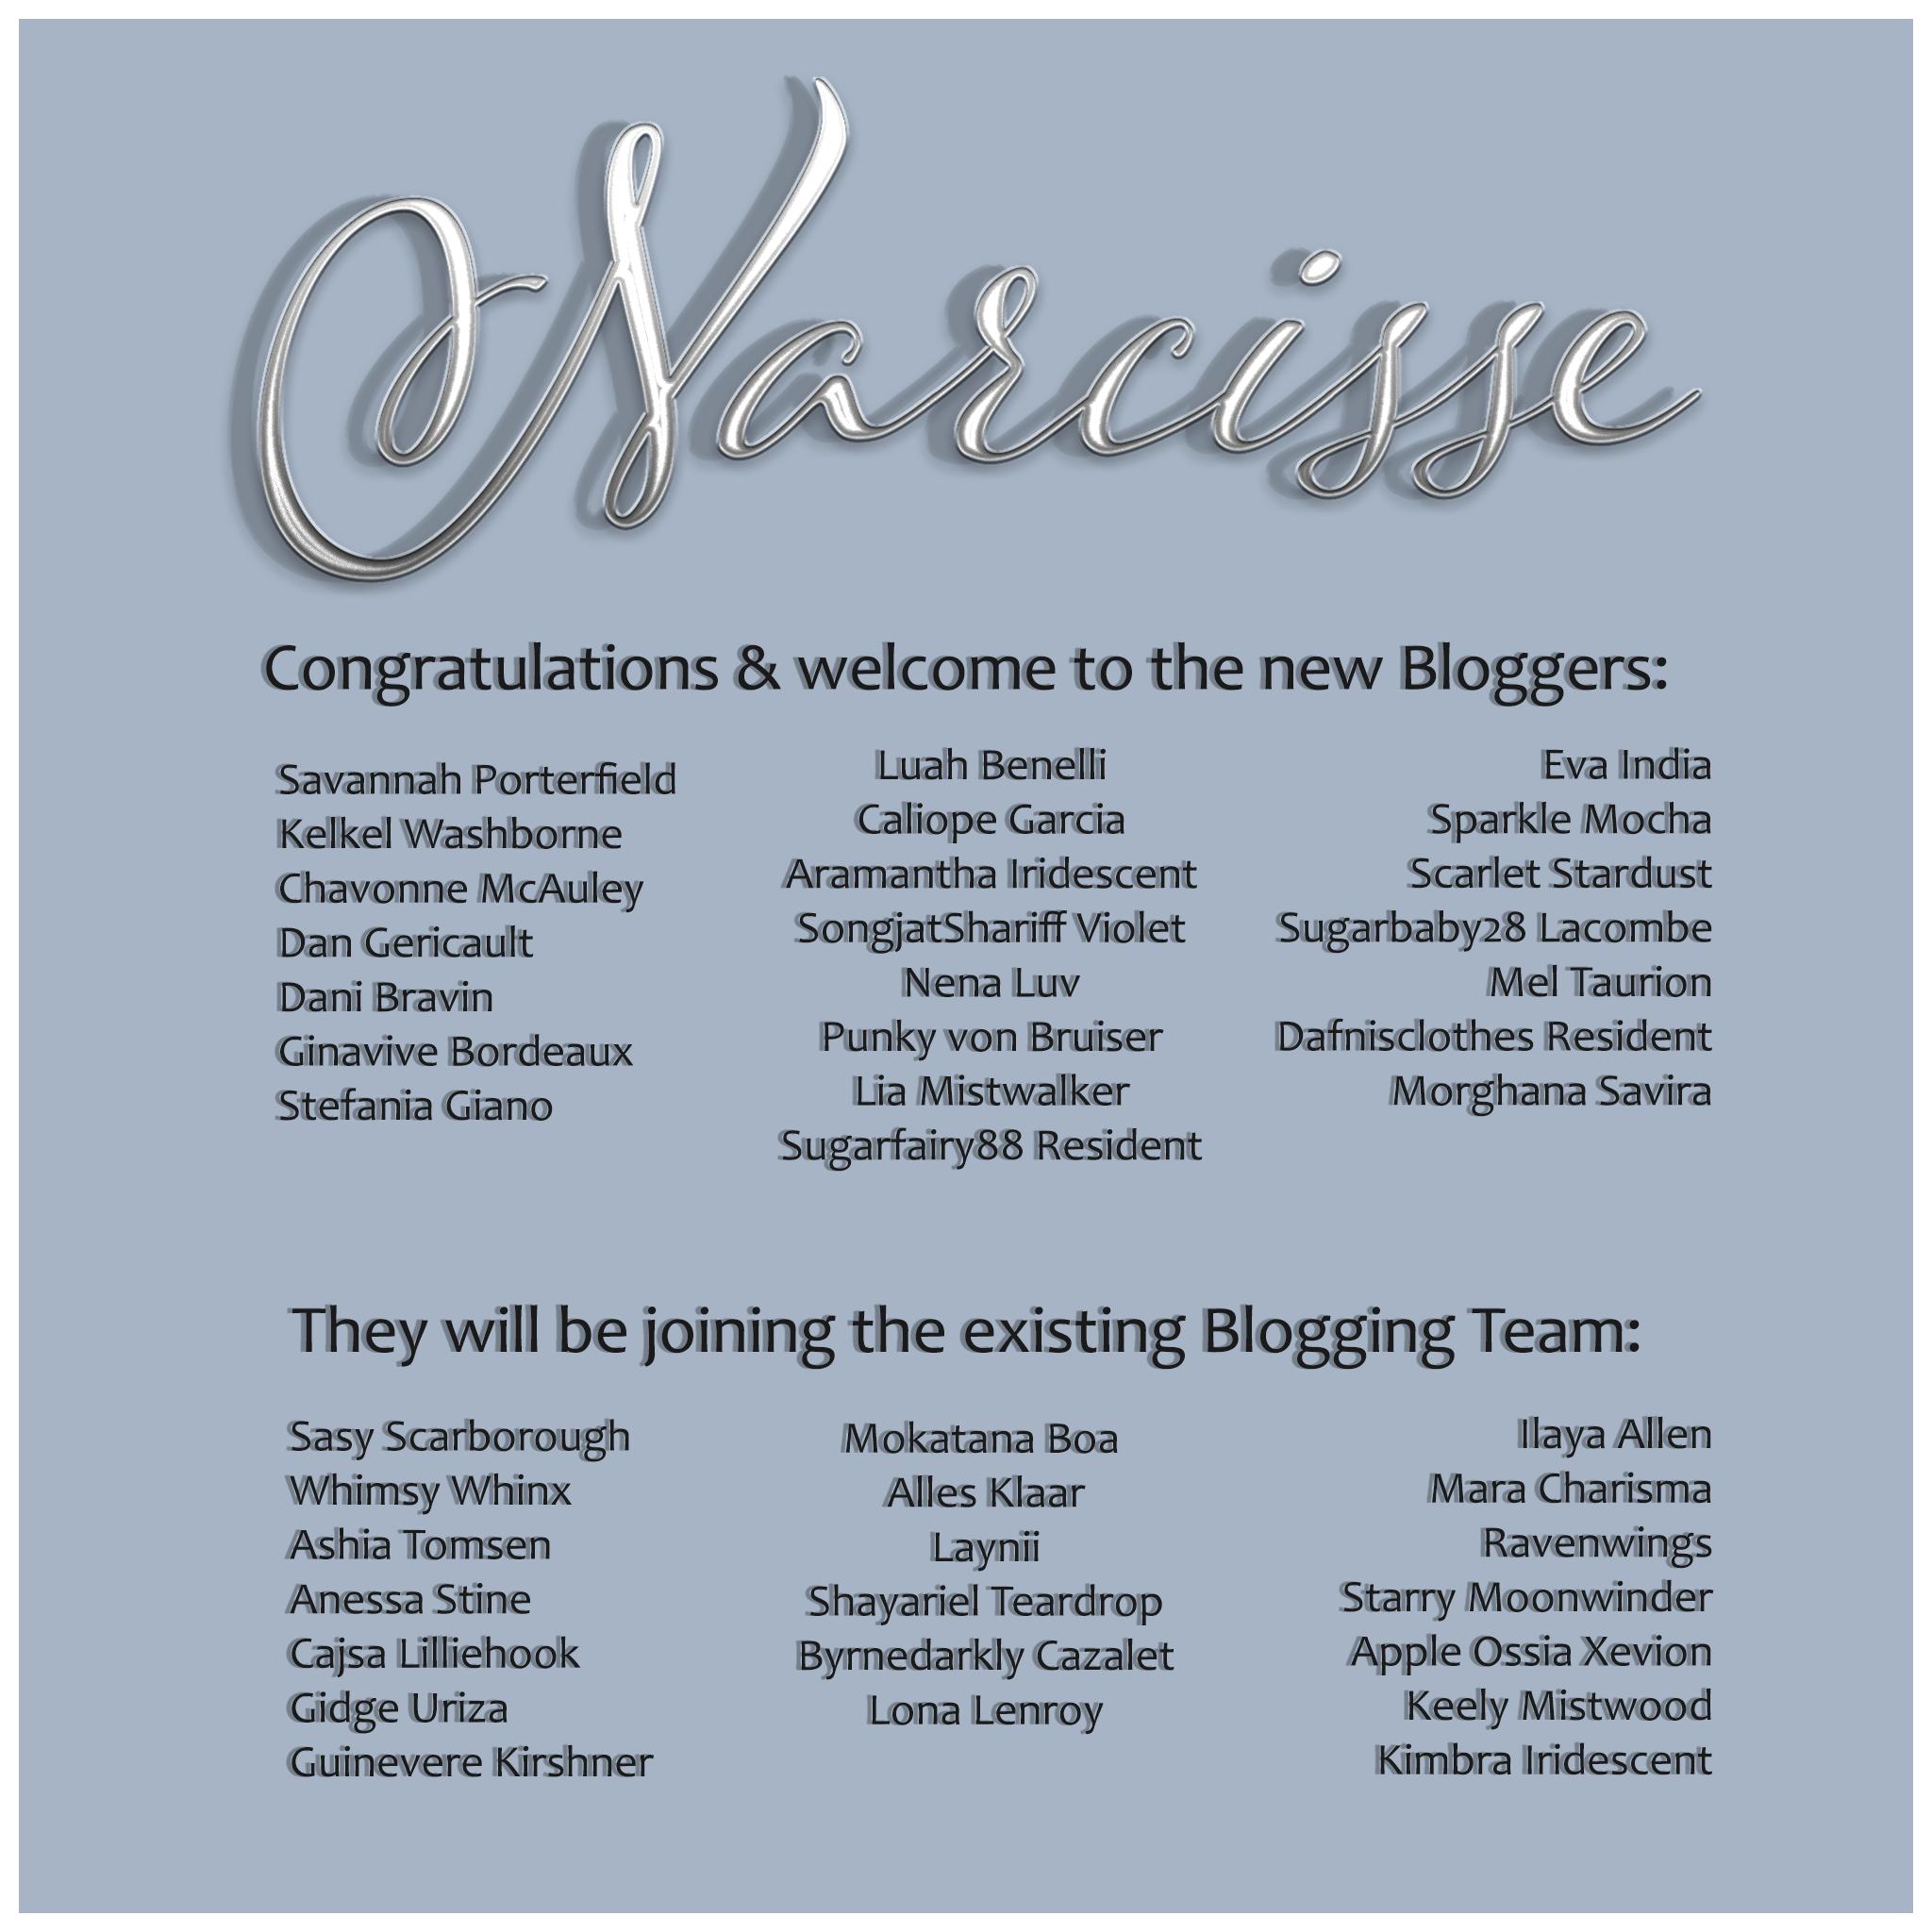 Congratulations Bloggers